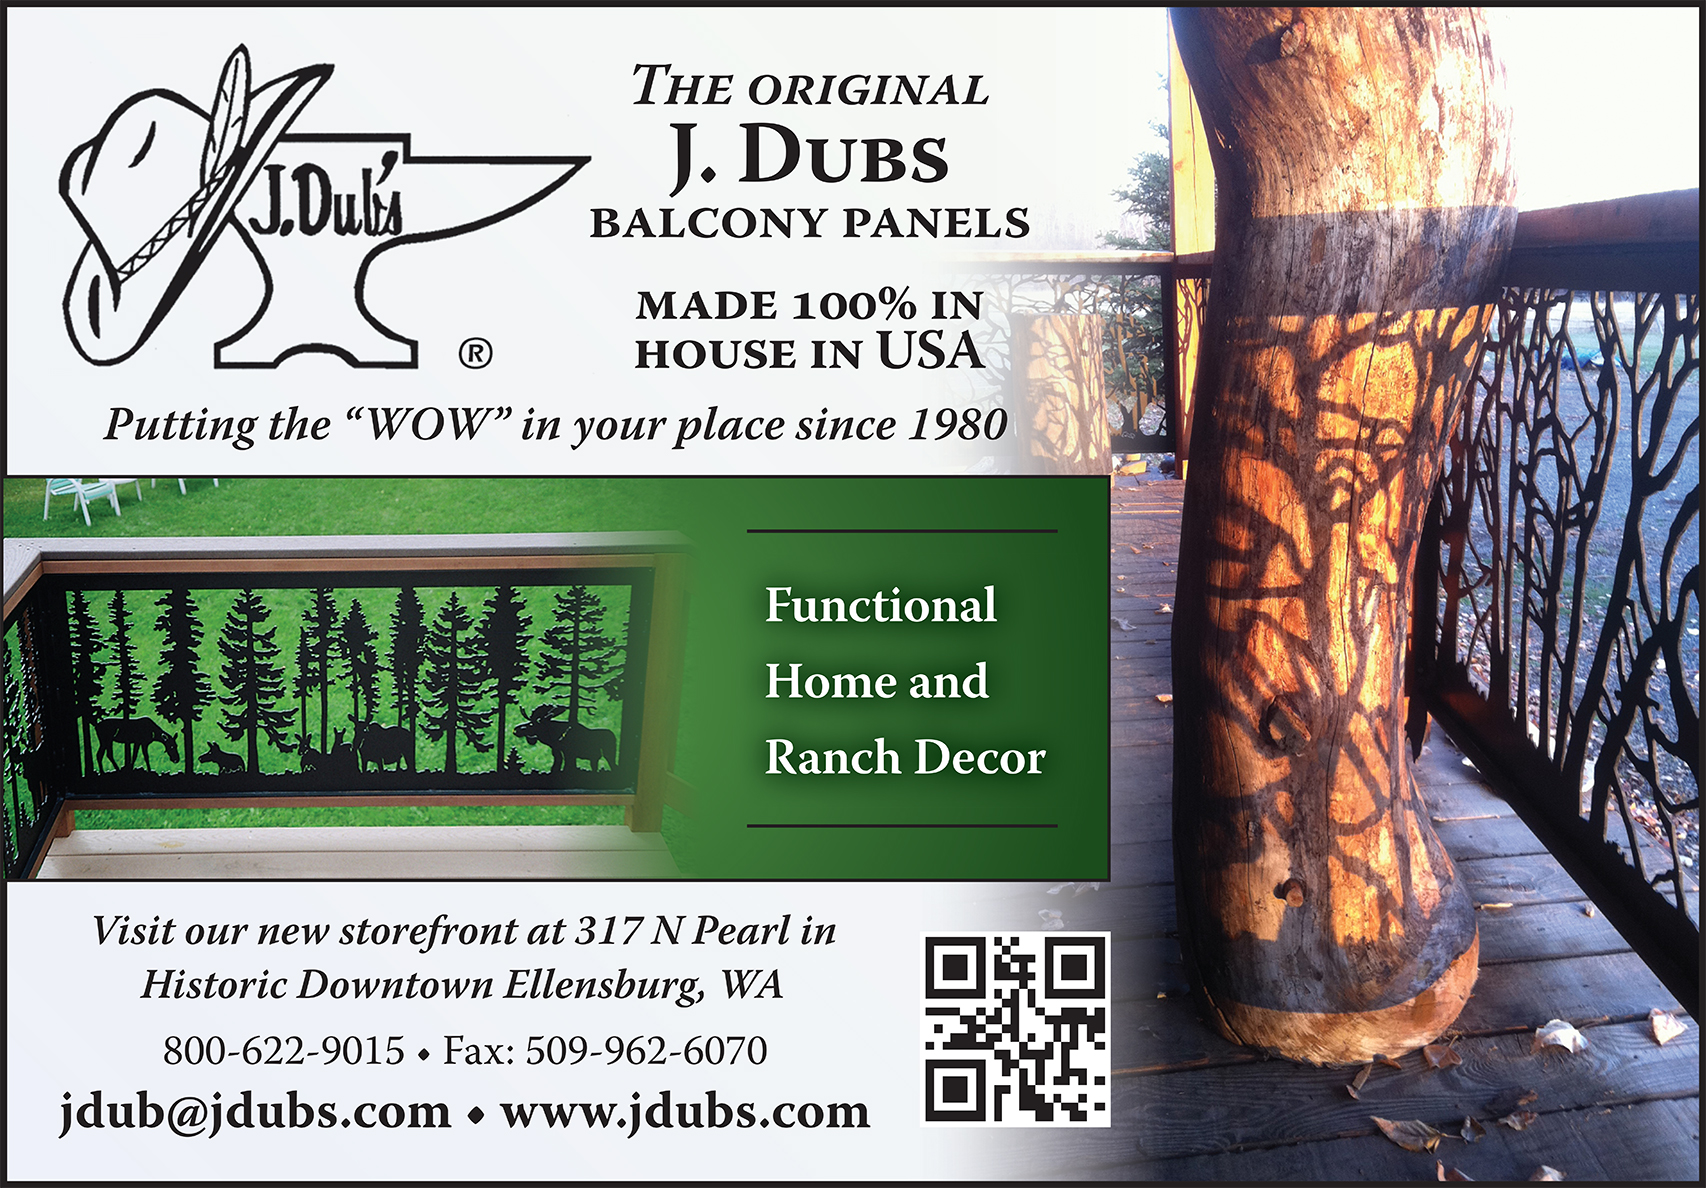 J. Dubs Balcony Panels Ad